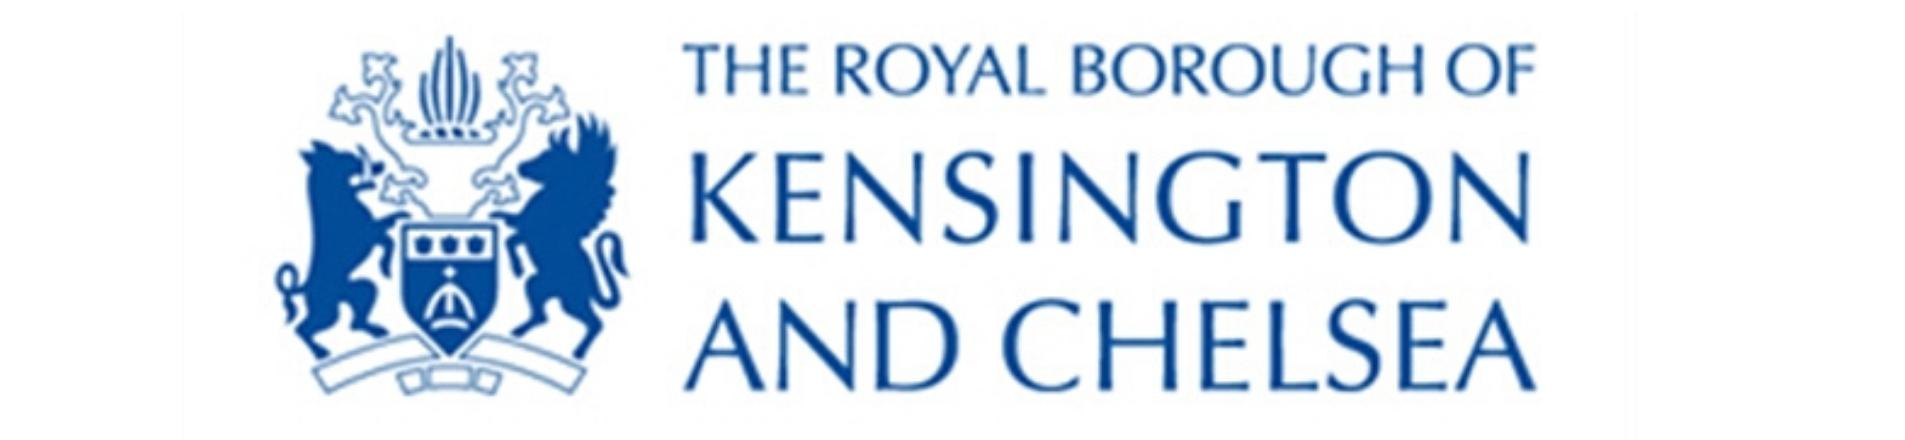 The Borough of Kensington & Chelsea Logo